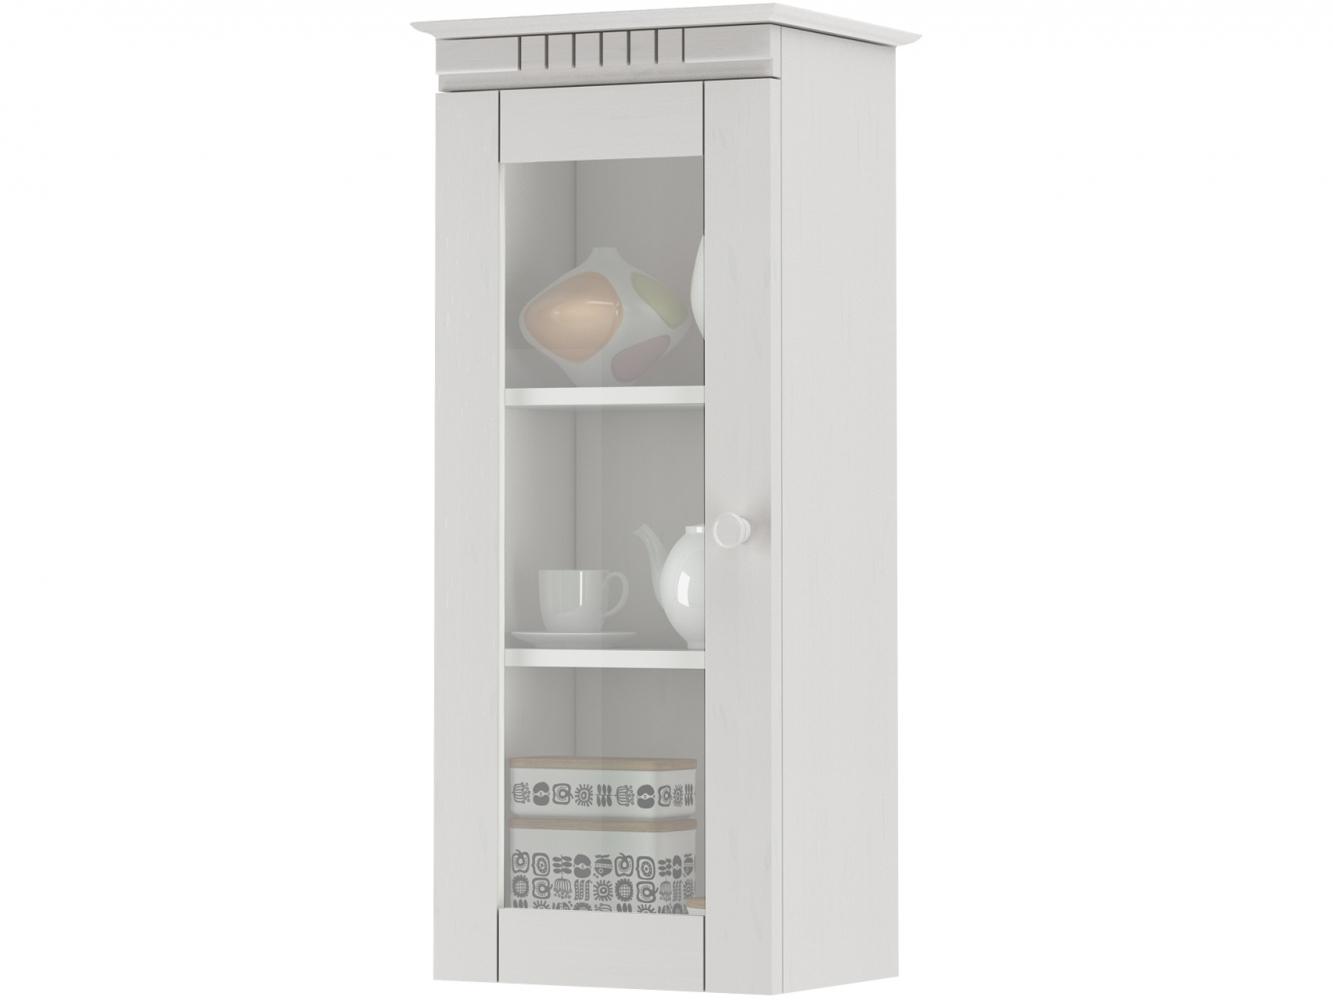 Skříňka Brix, 85 cm, bílá / sklo